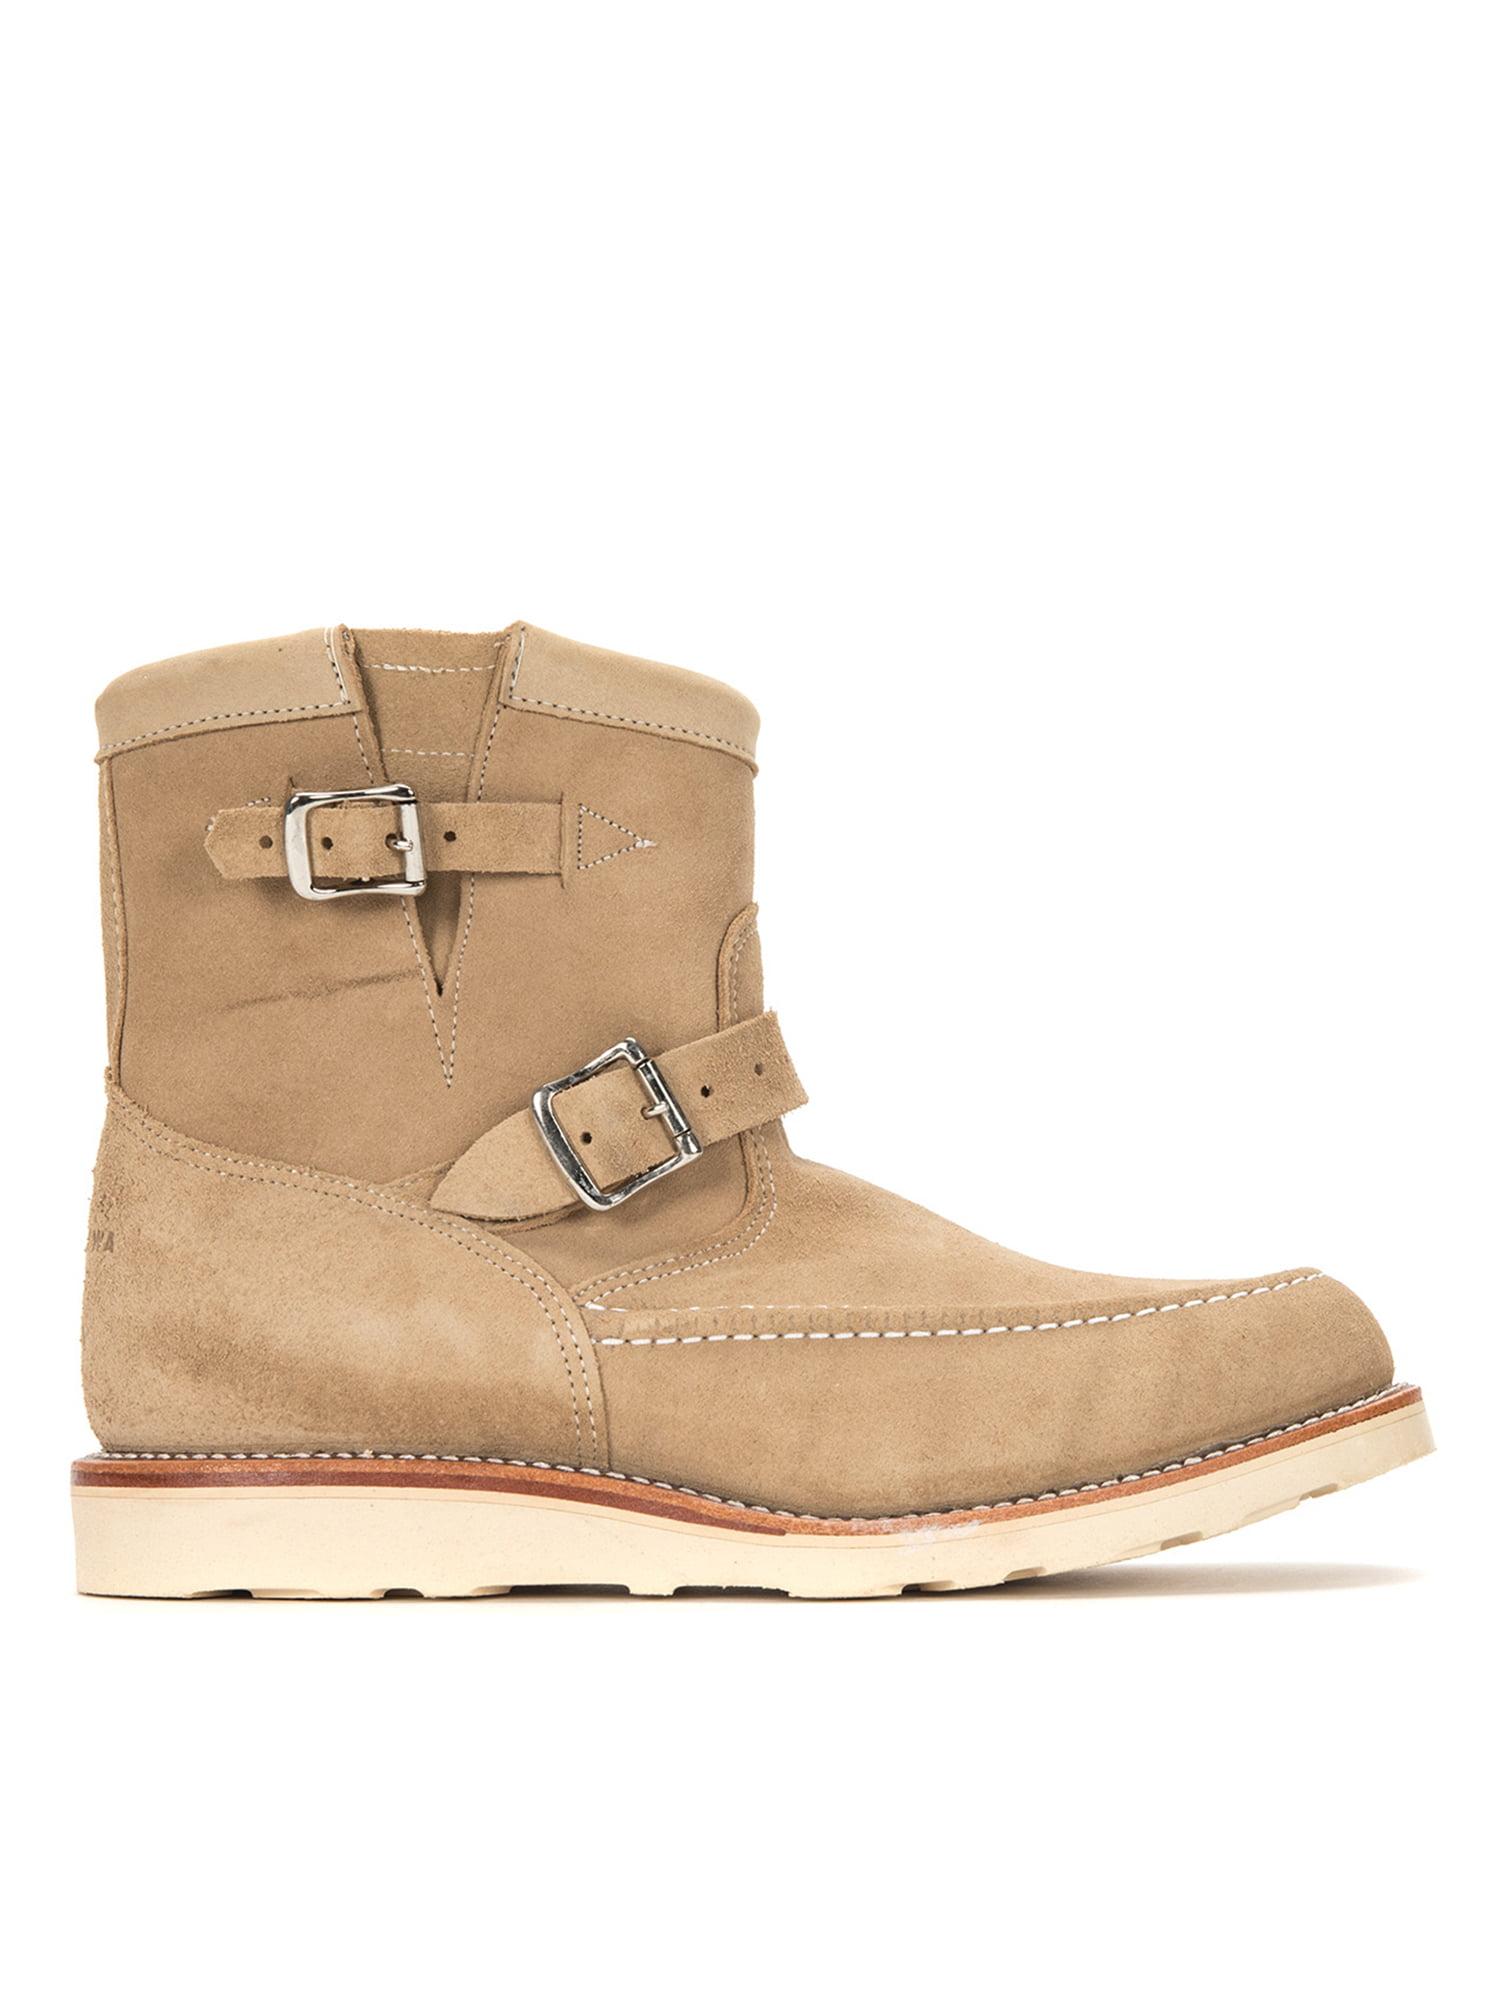 "Chippewa Men's 7"" Highlander Boots 1901M09 Sand Suede SZ 11.5"